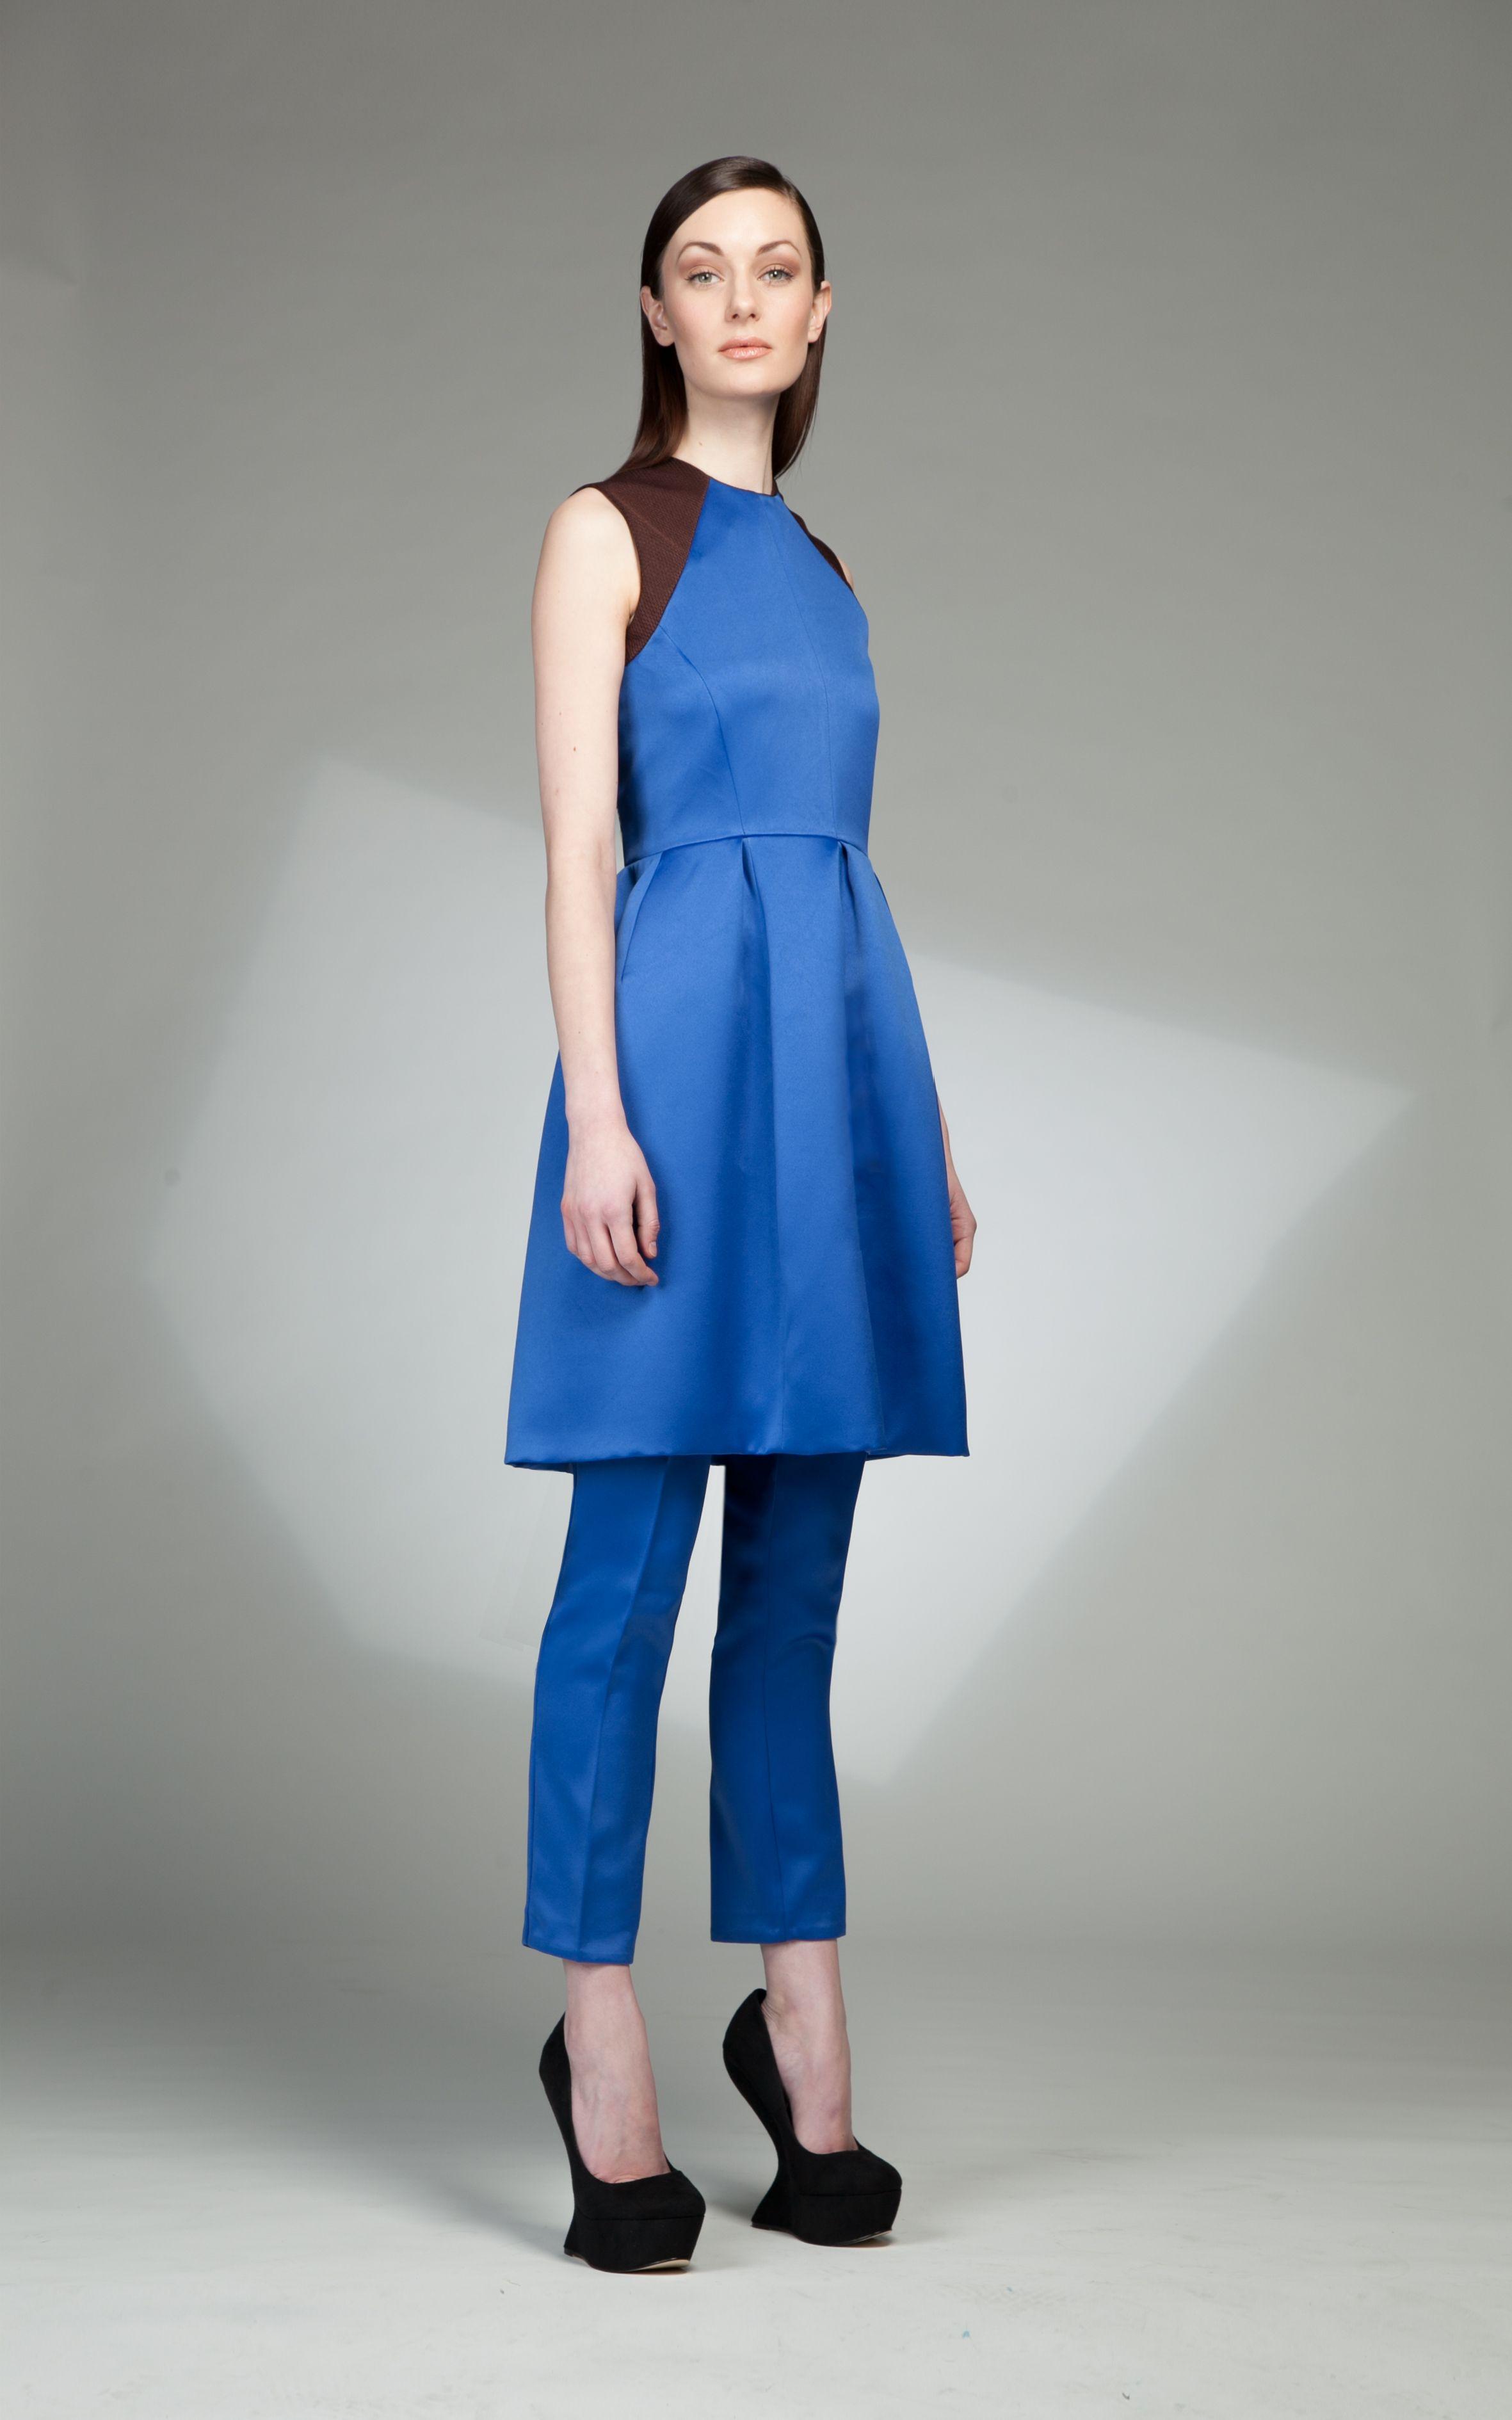 Www Codelevush Com Emerging Designers Fashion Fashion Design Fashion